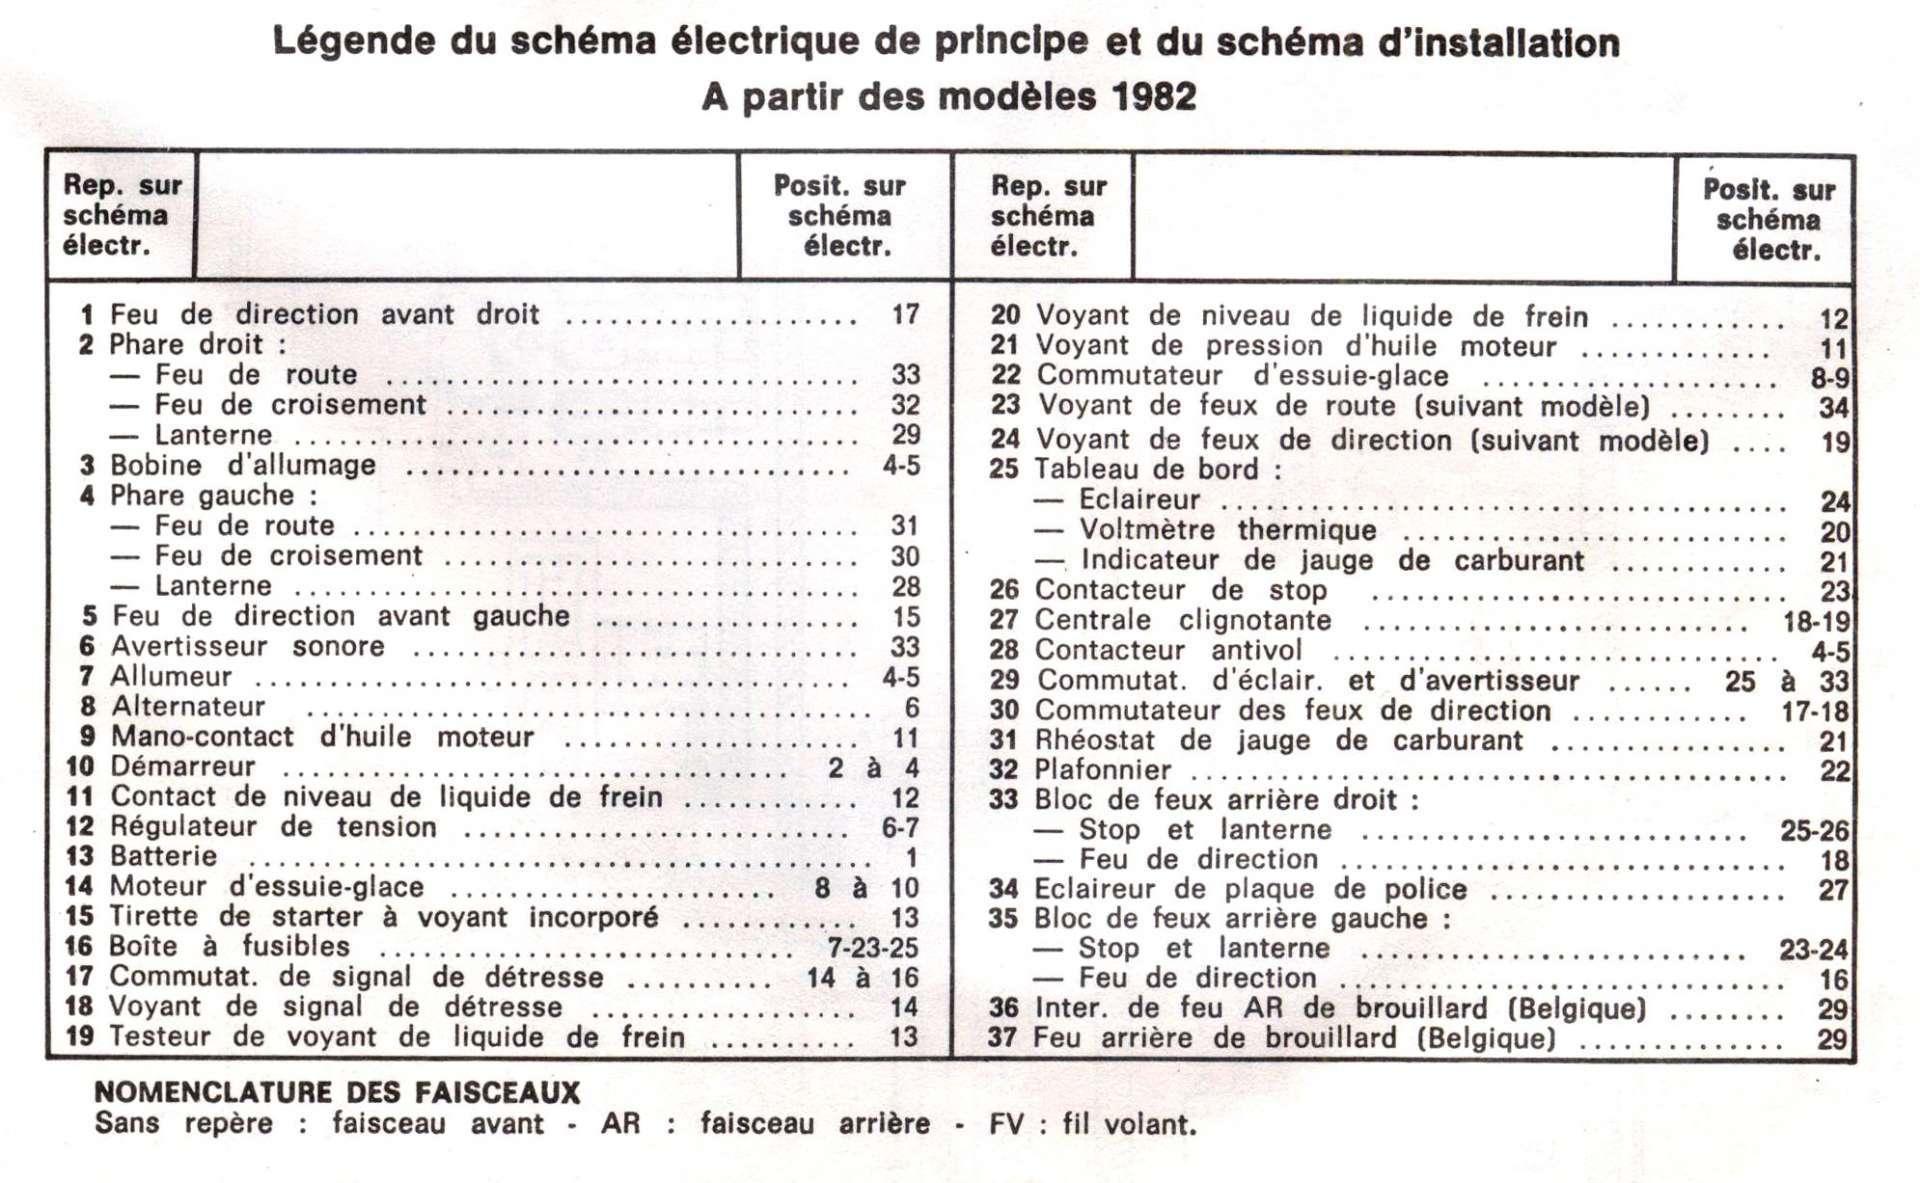 Legenda Schemi Elettrici : Simboli elettrici dwg impianto elettrico xatu con simboli schemi